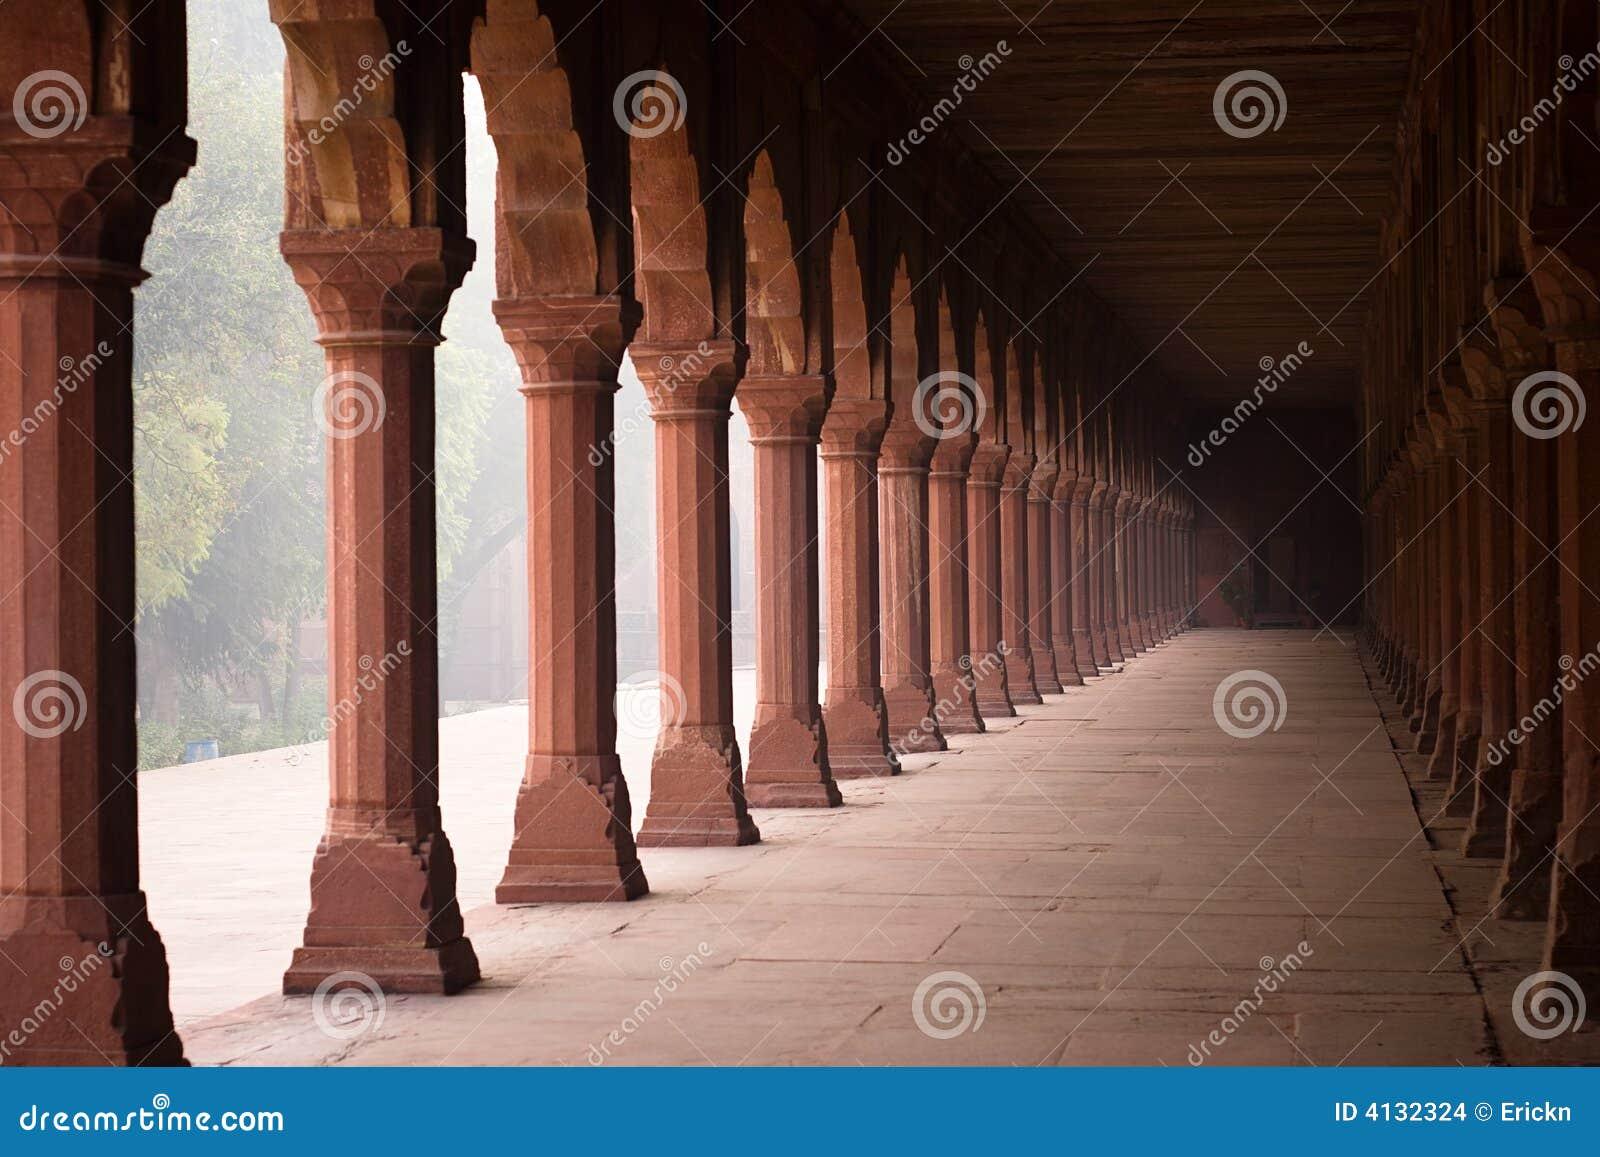 Entrance corridor to the taj mahal stock images image 4132324 - Corridor entrance ...